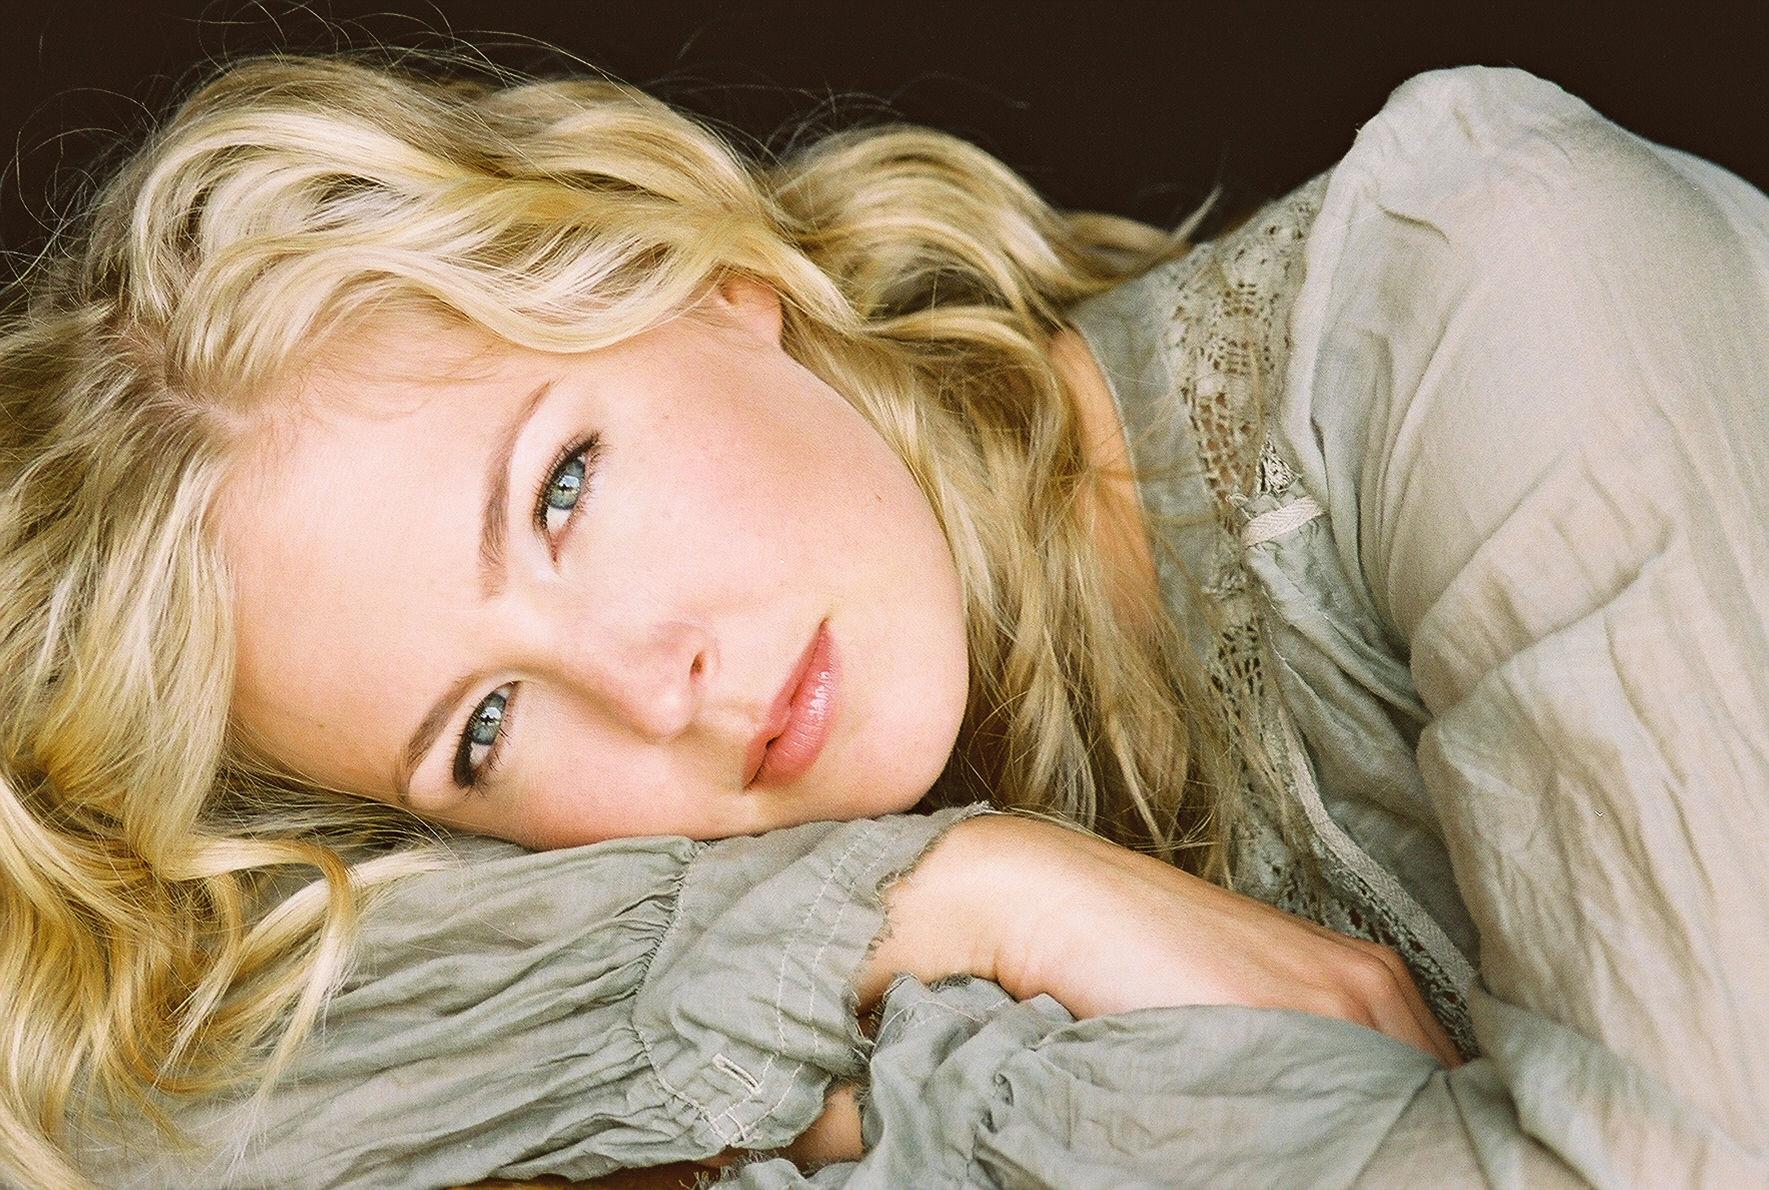 Photo of Keri Lynn Pratt: American actress